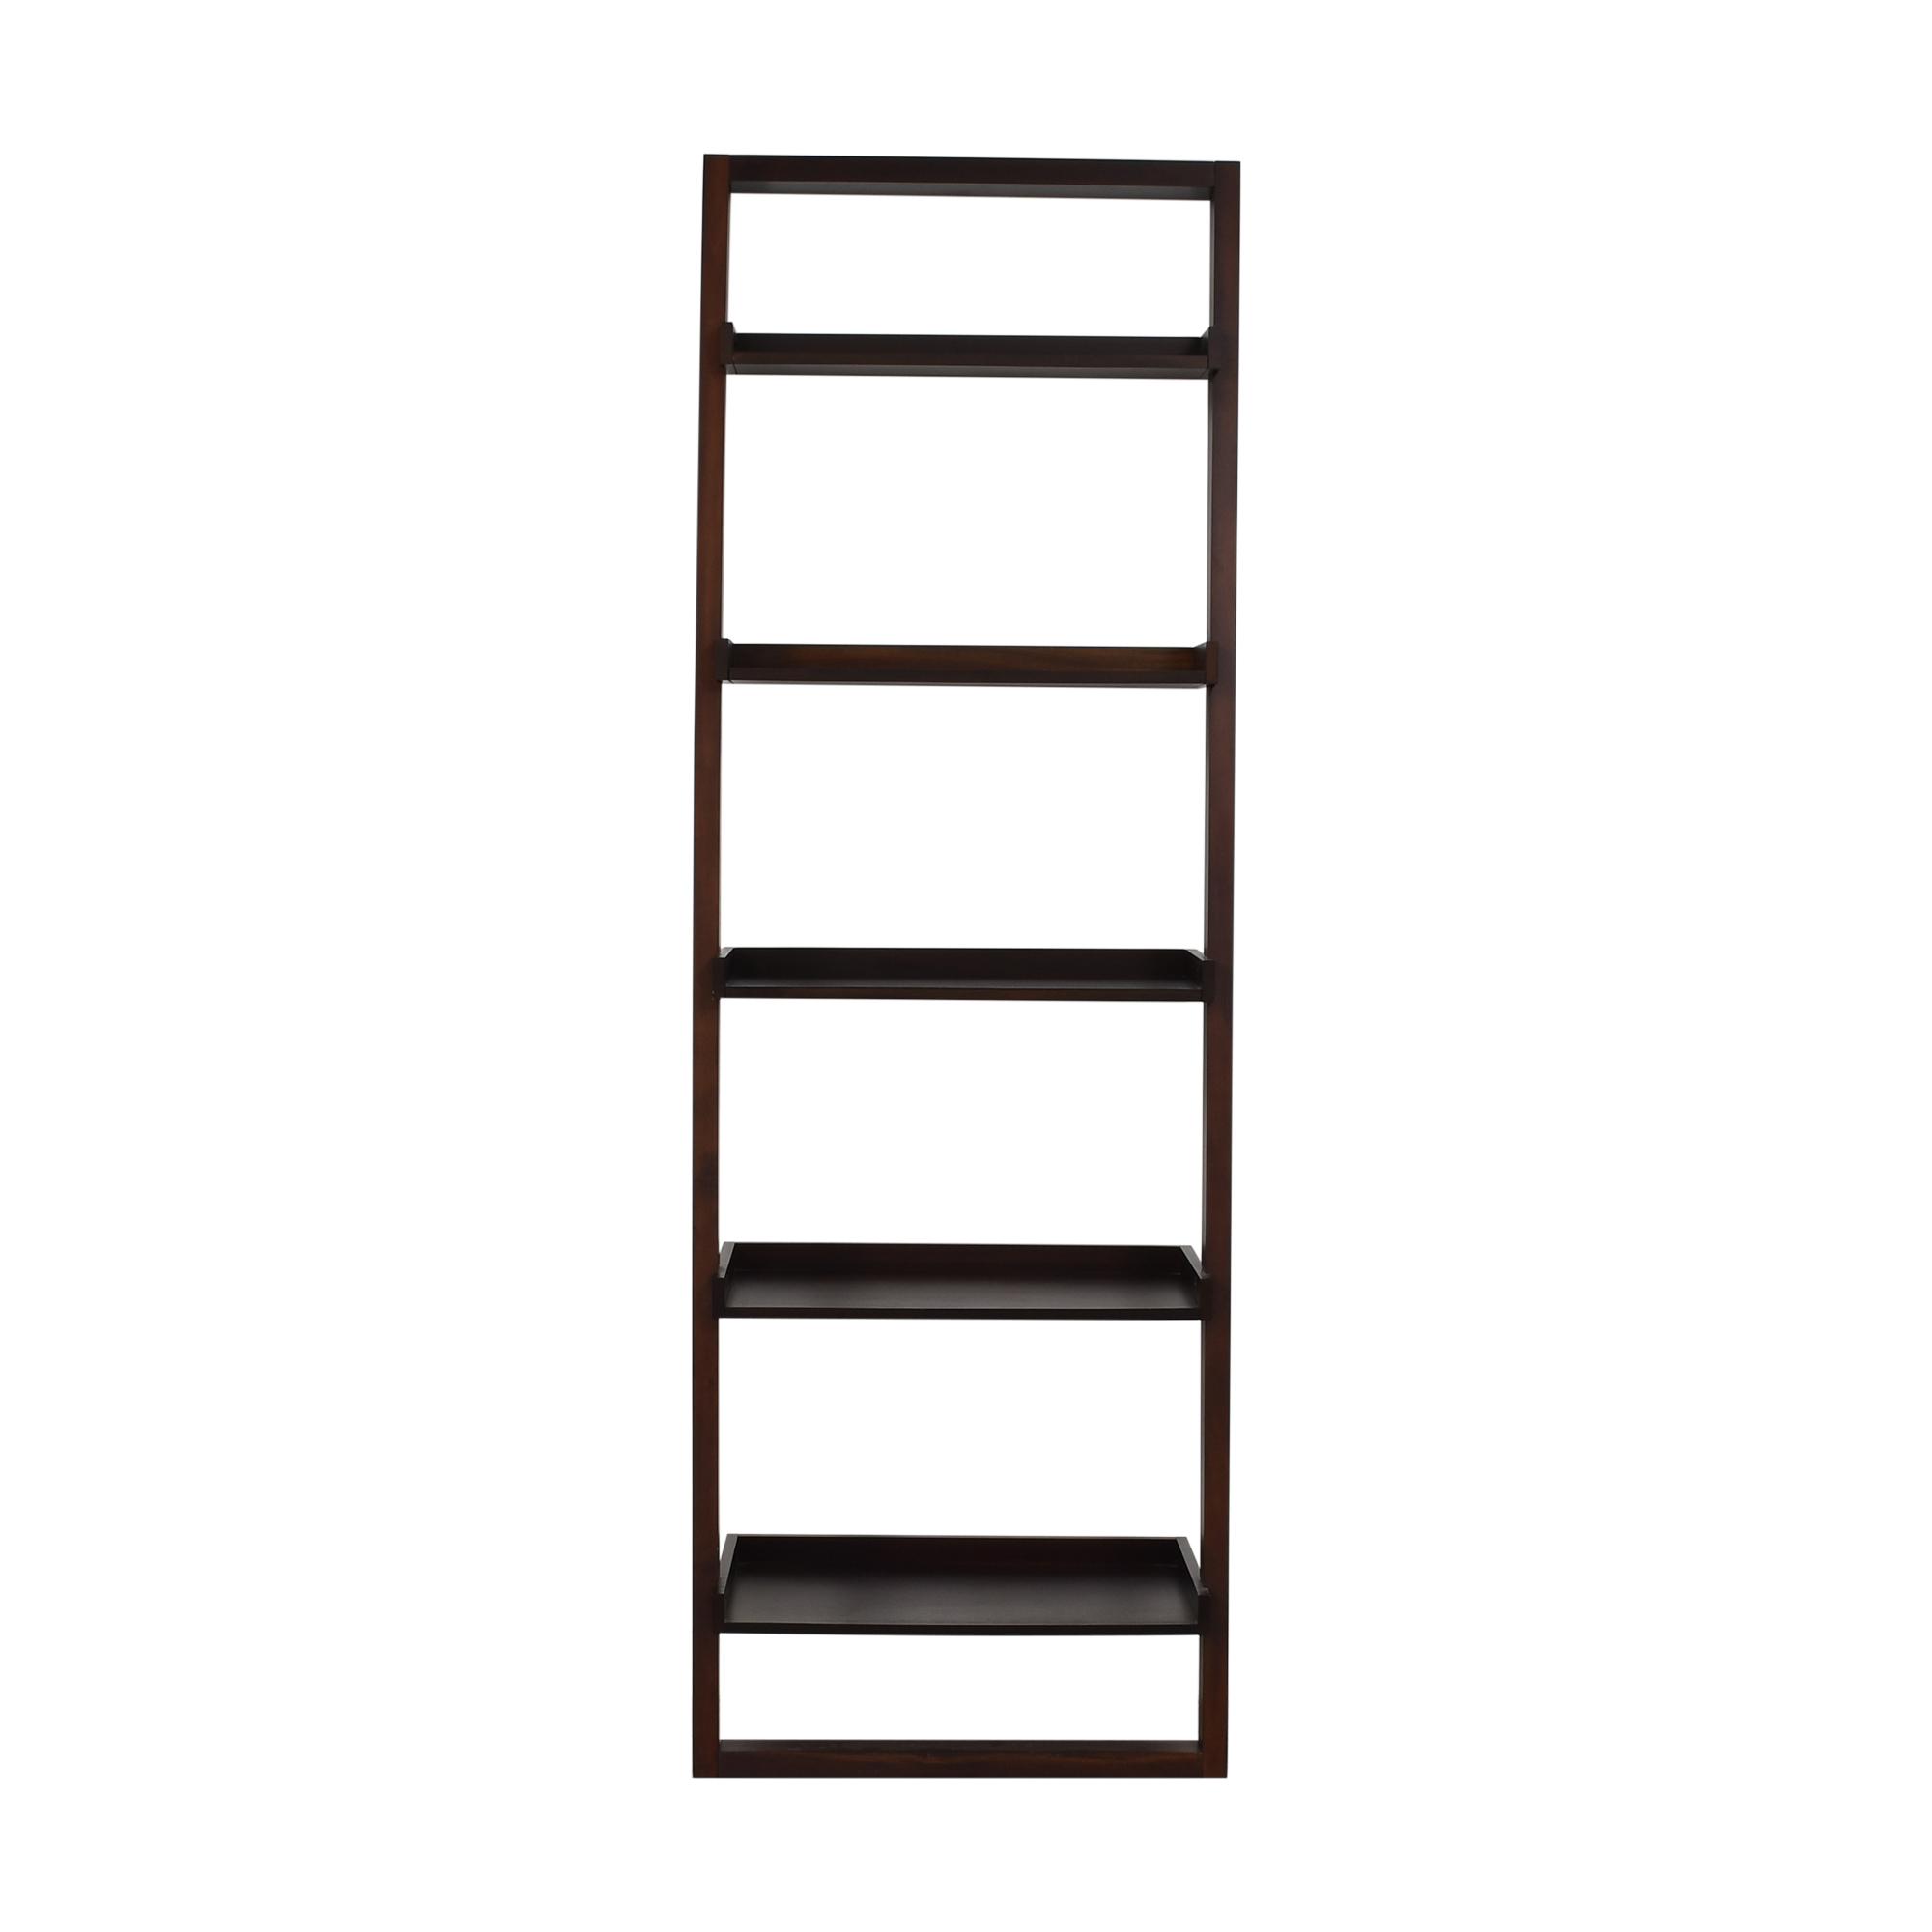 buy Crate & Barrel Crate & Barrel Leaning Bookshelf online